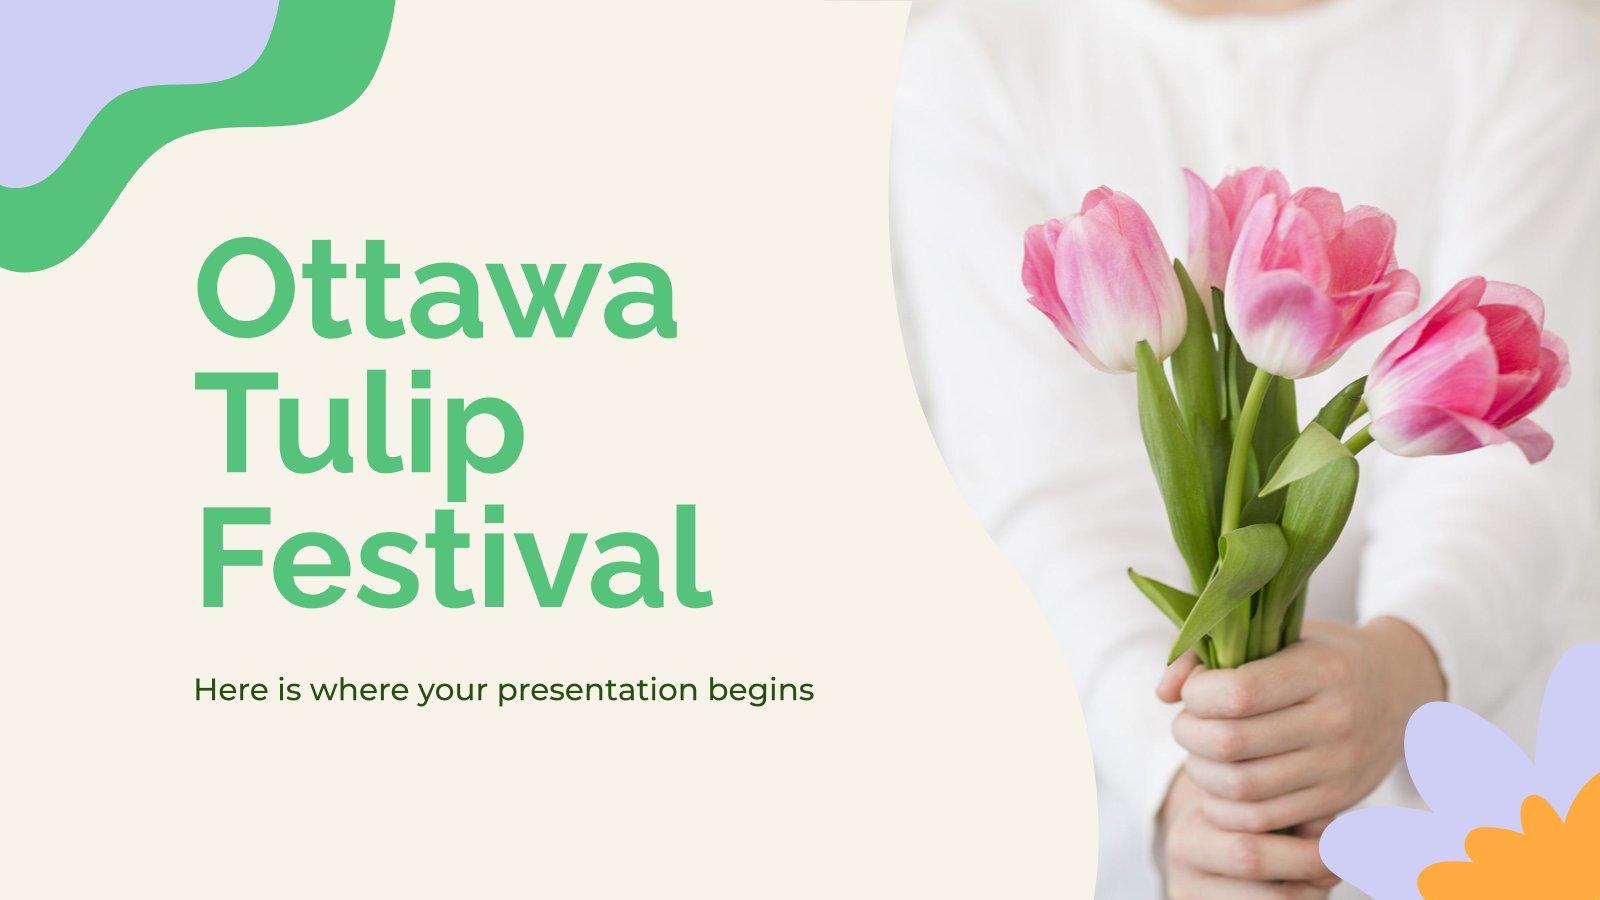 Plantilla de presentación Festival de tulipanes de Ottawa